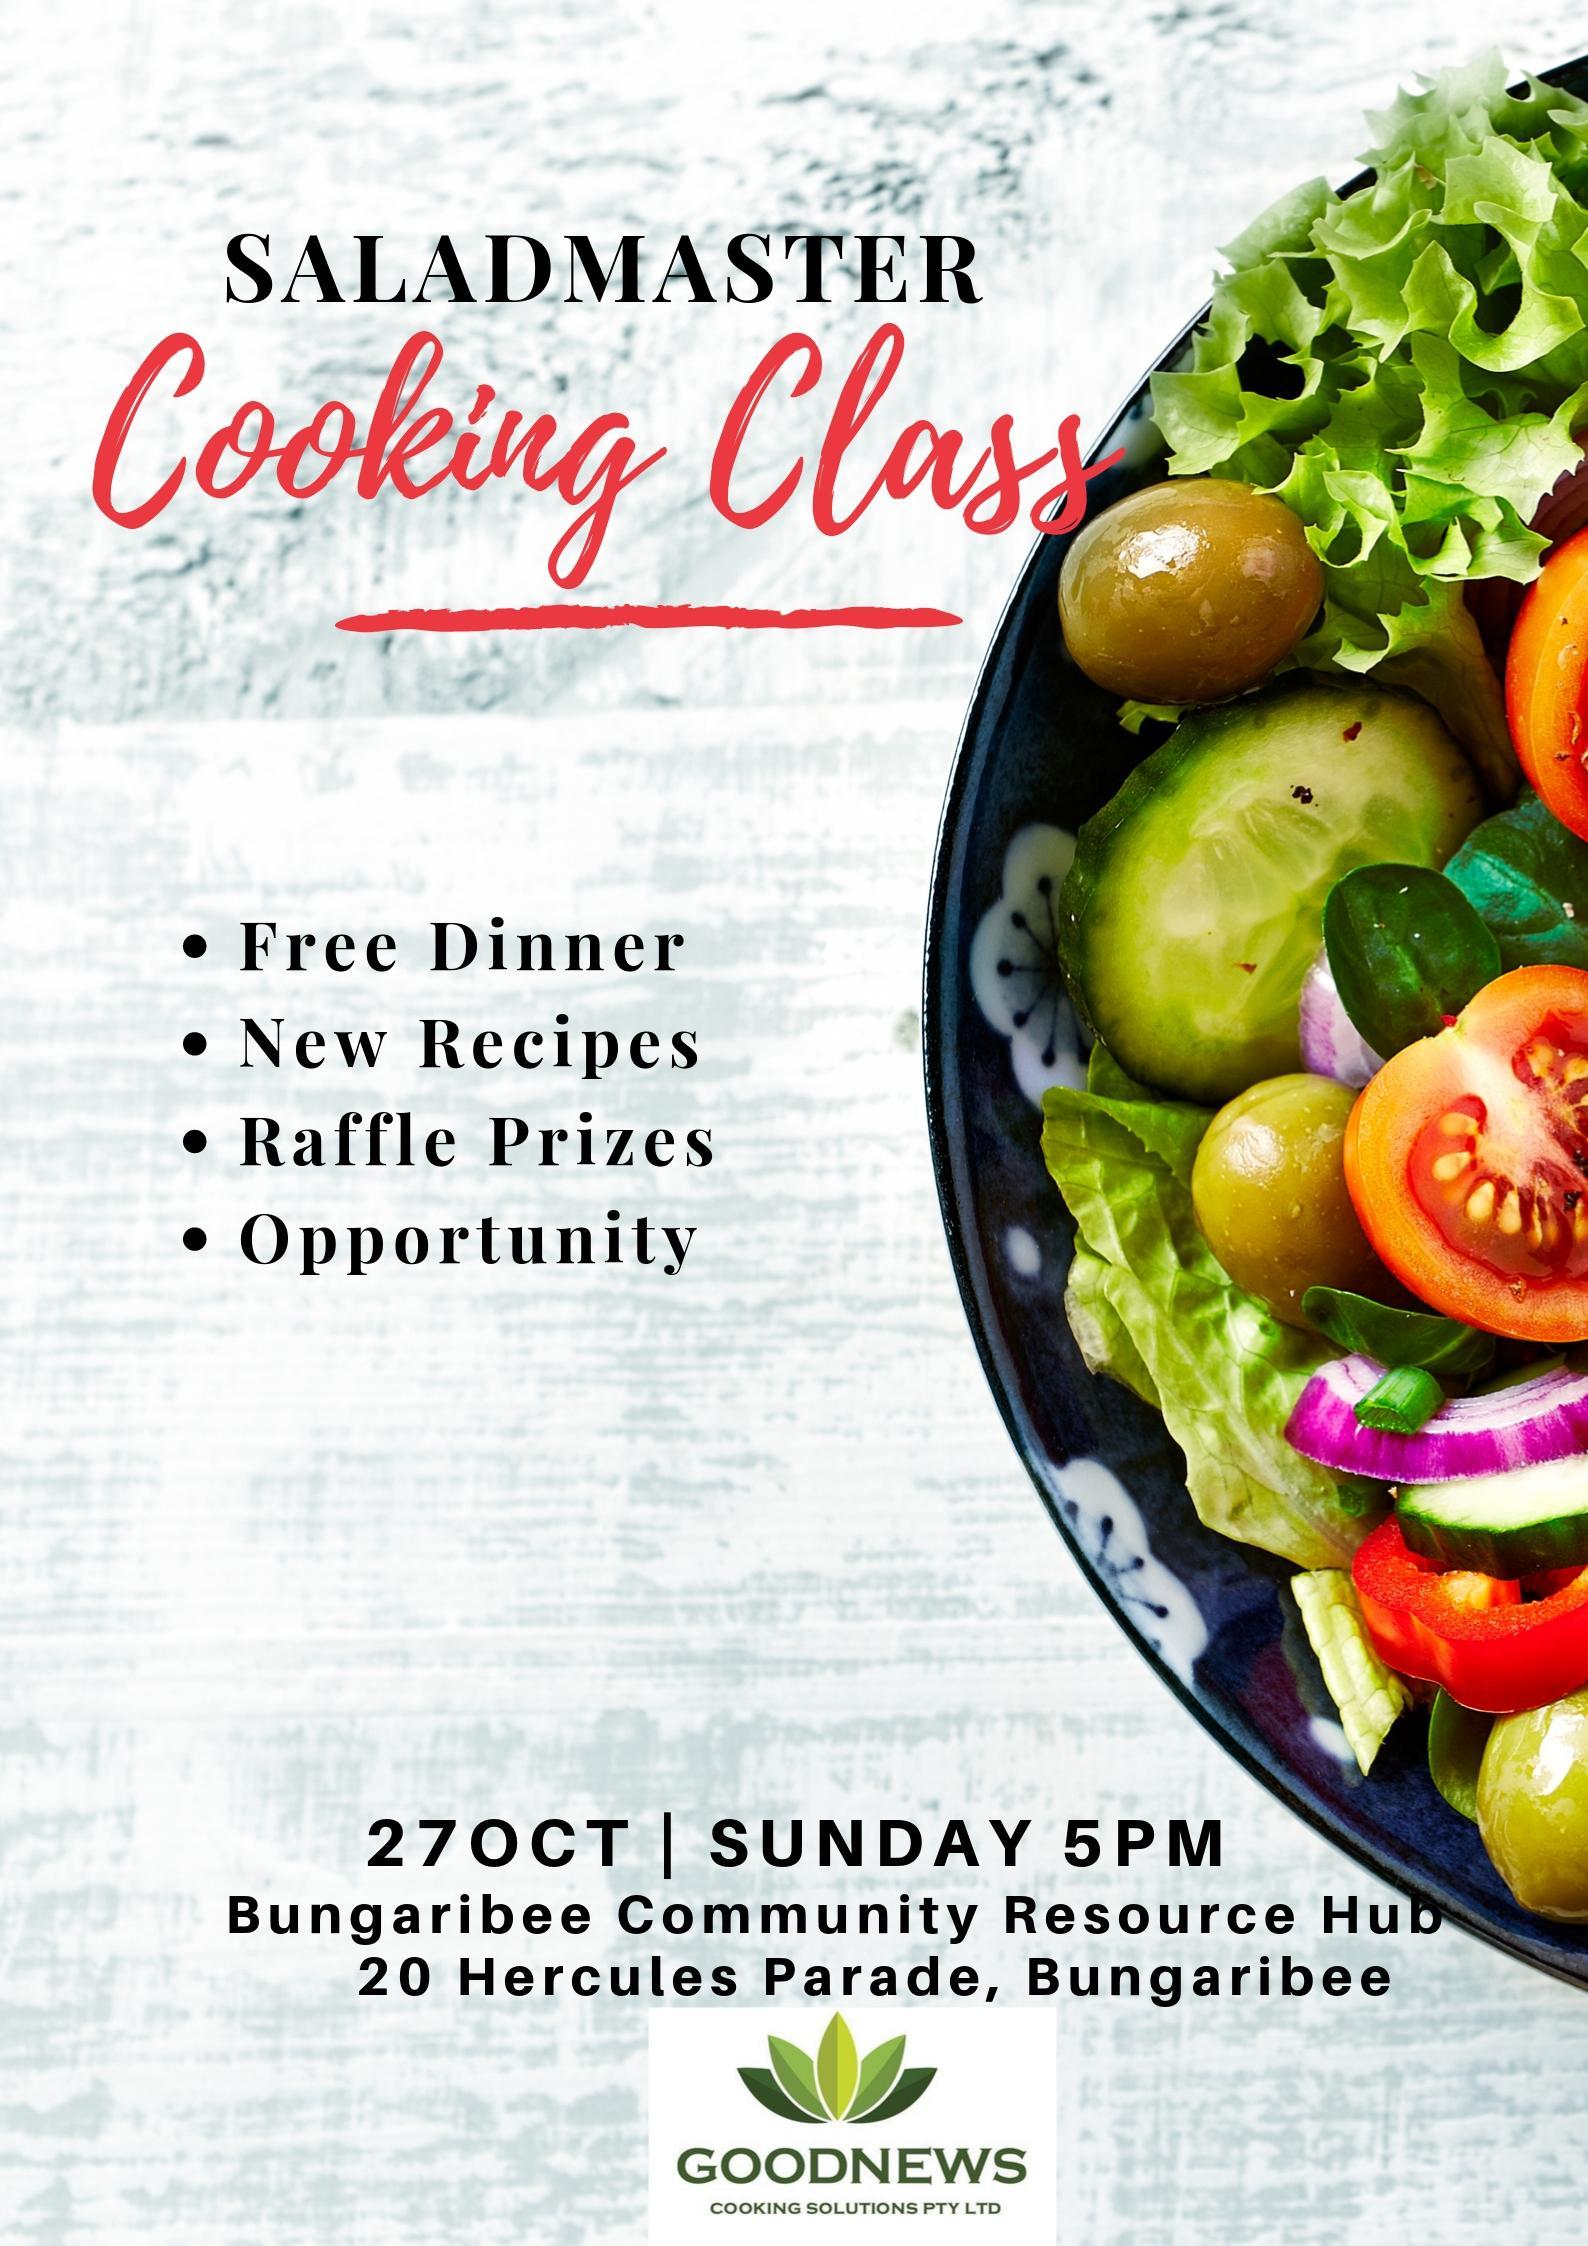 Saladmaster Cooking Class Invitation